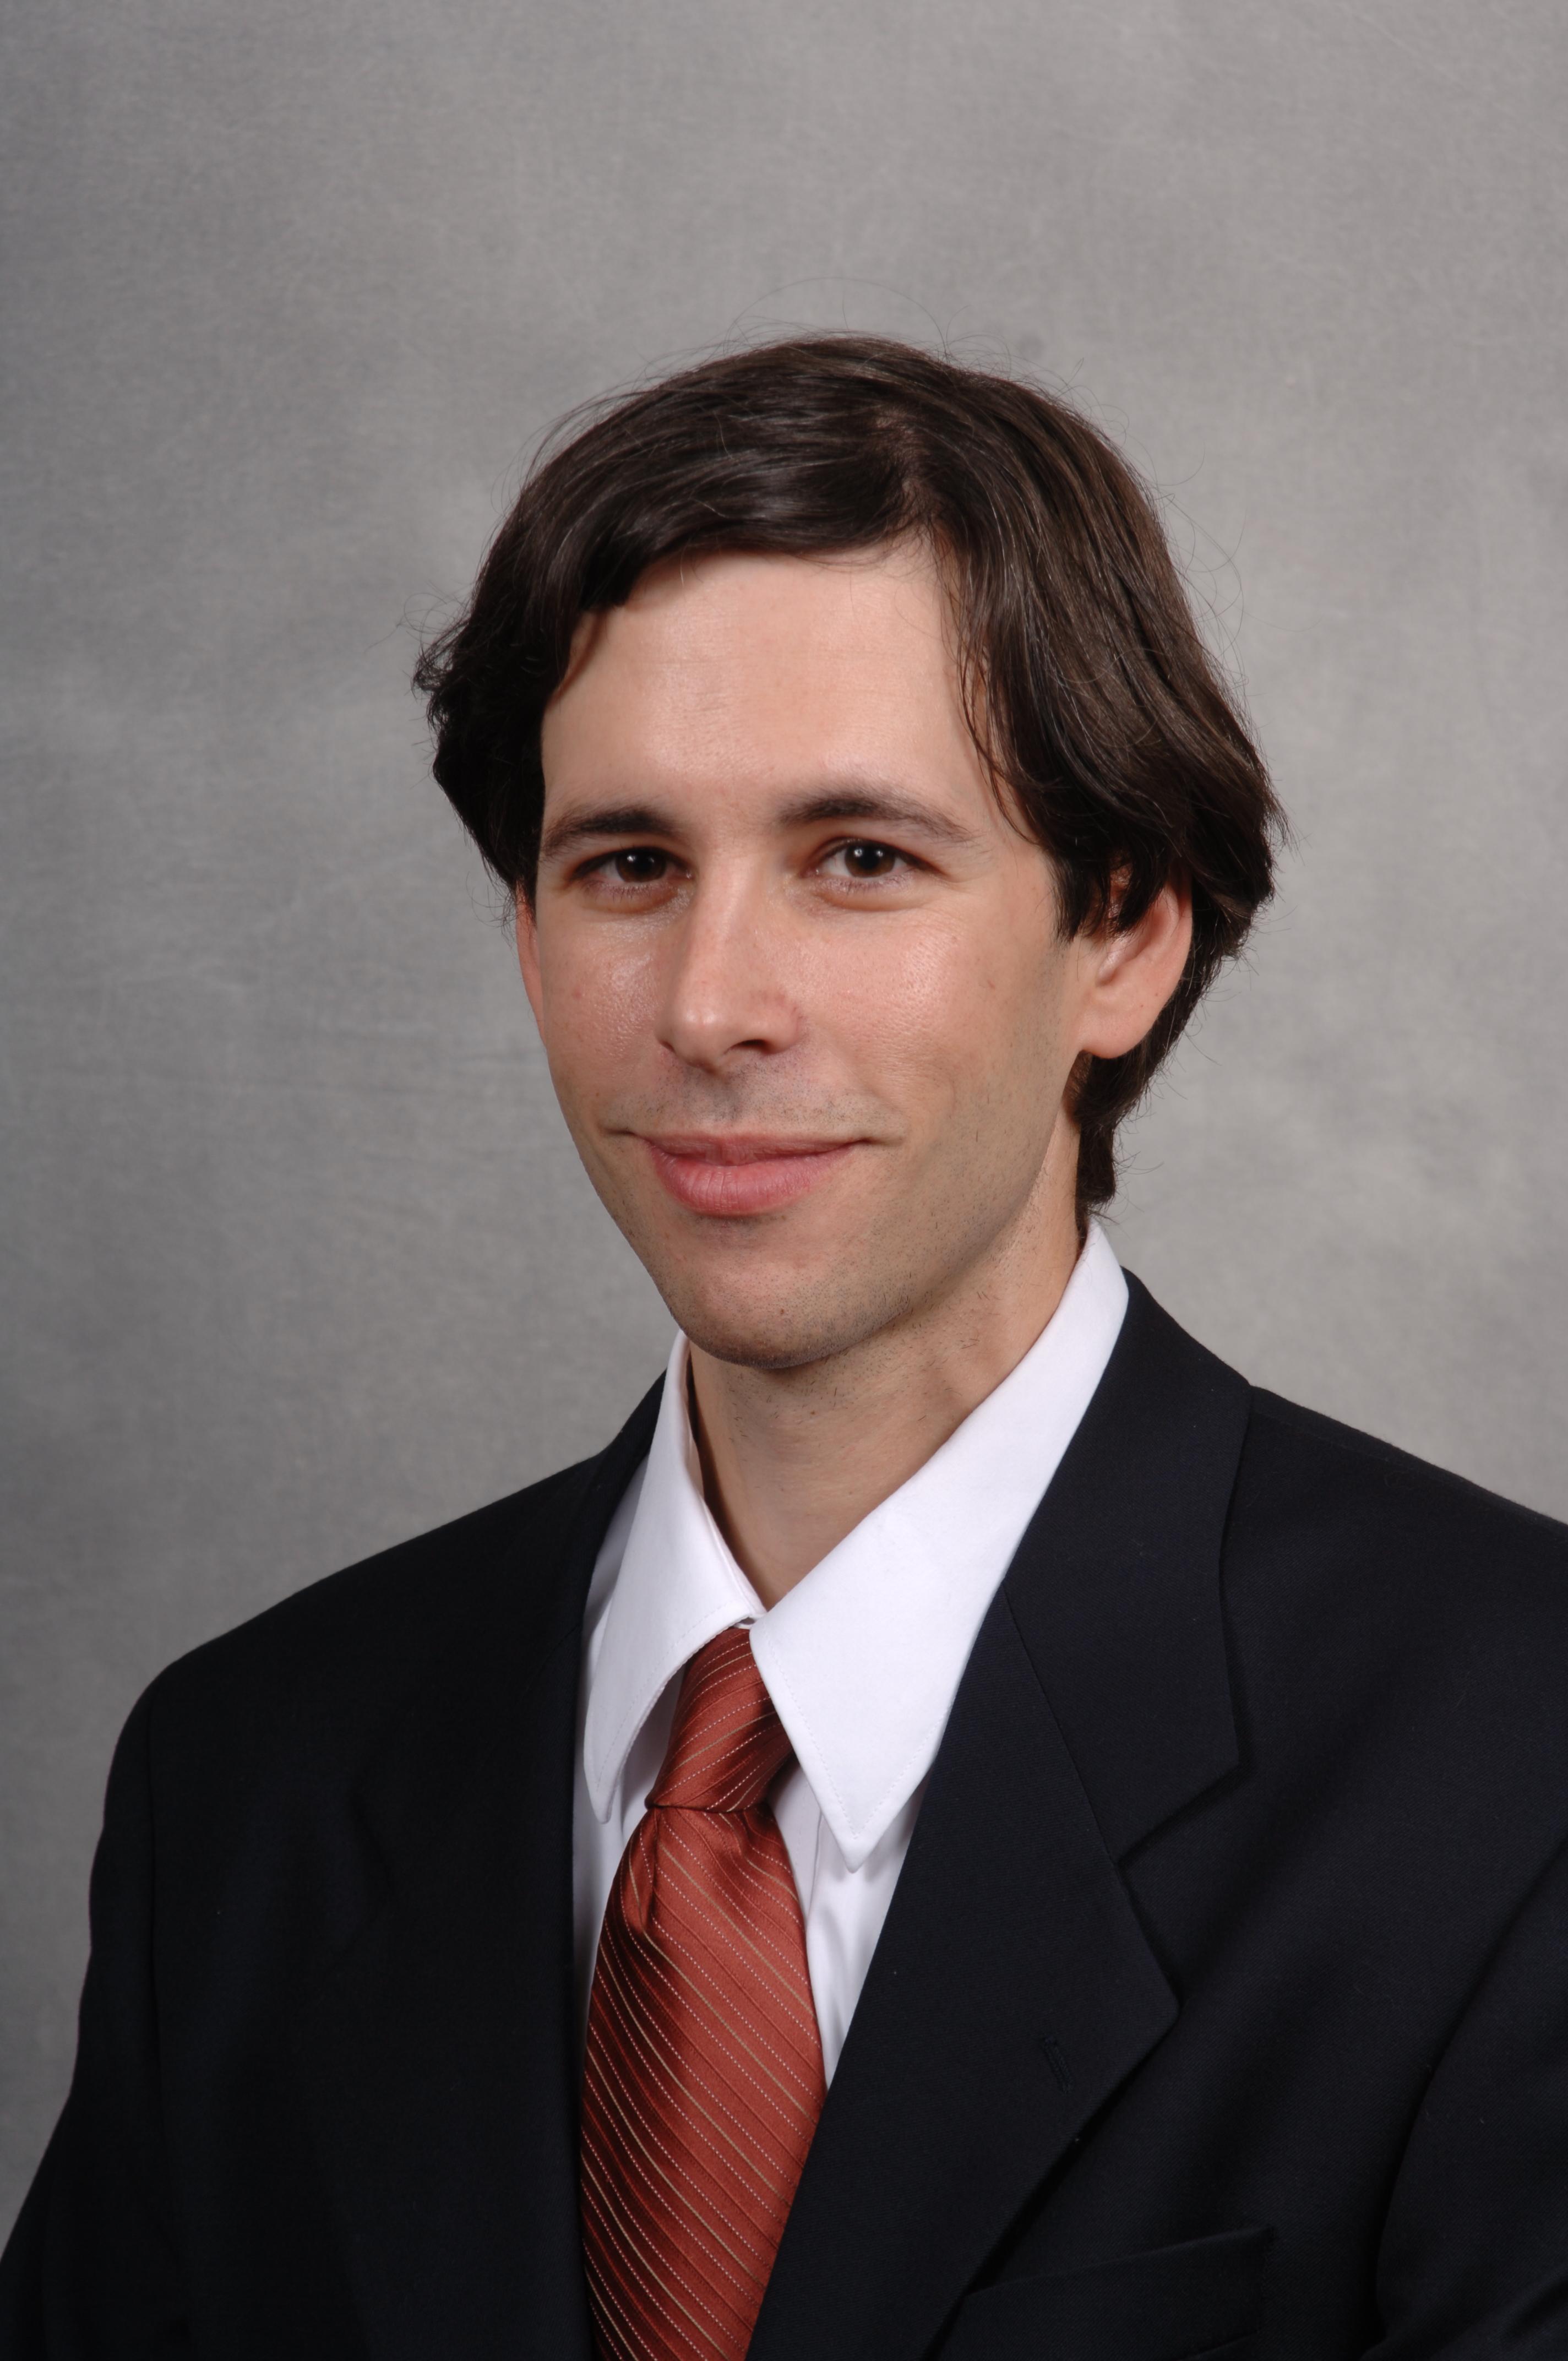 Jason Borenstein, Board Member